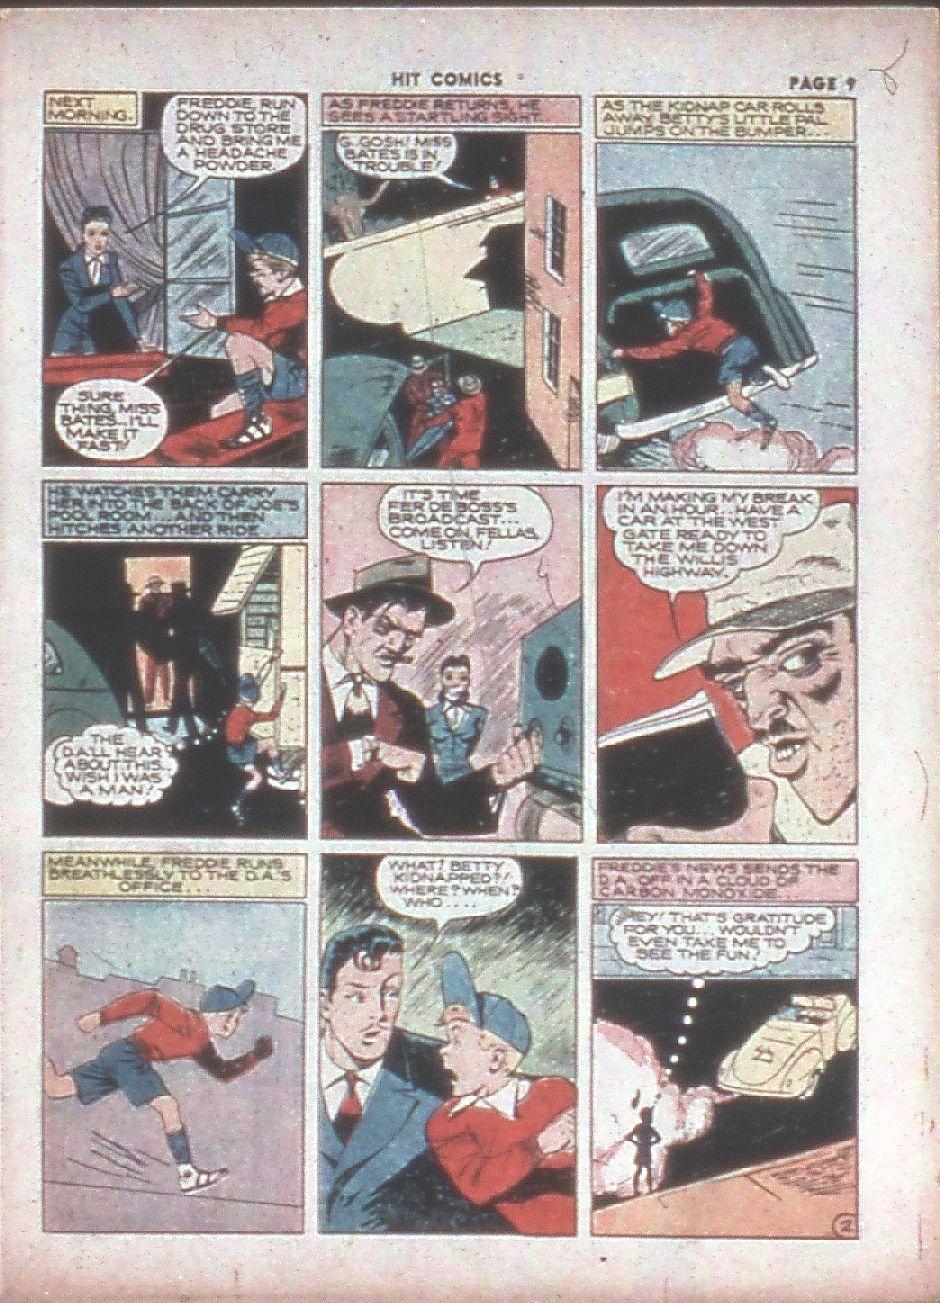 Read online Hit Comics comic -  Issue #8 - 11